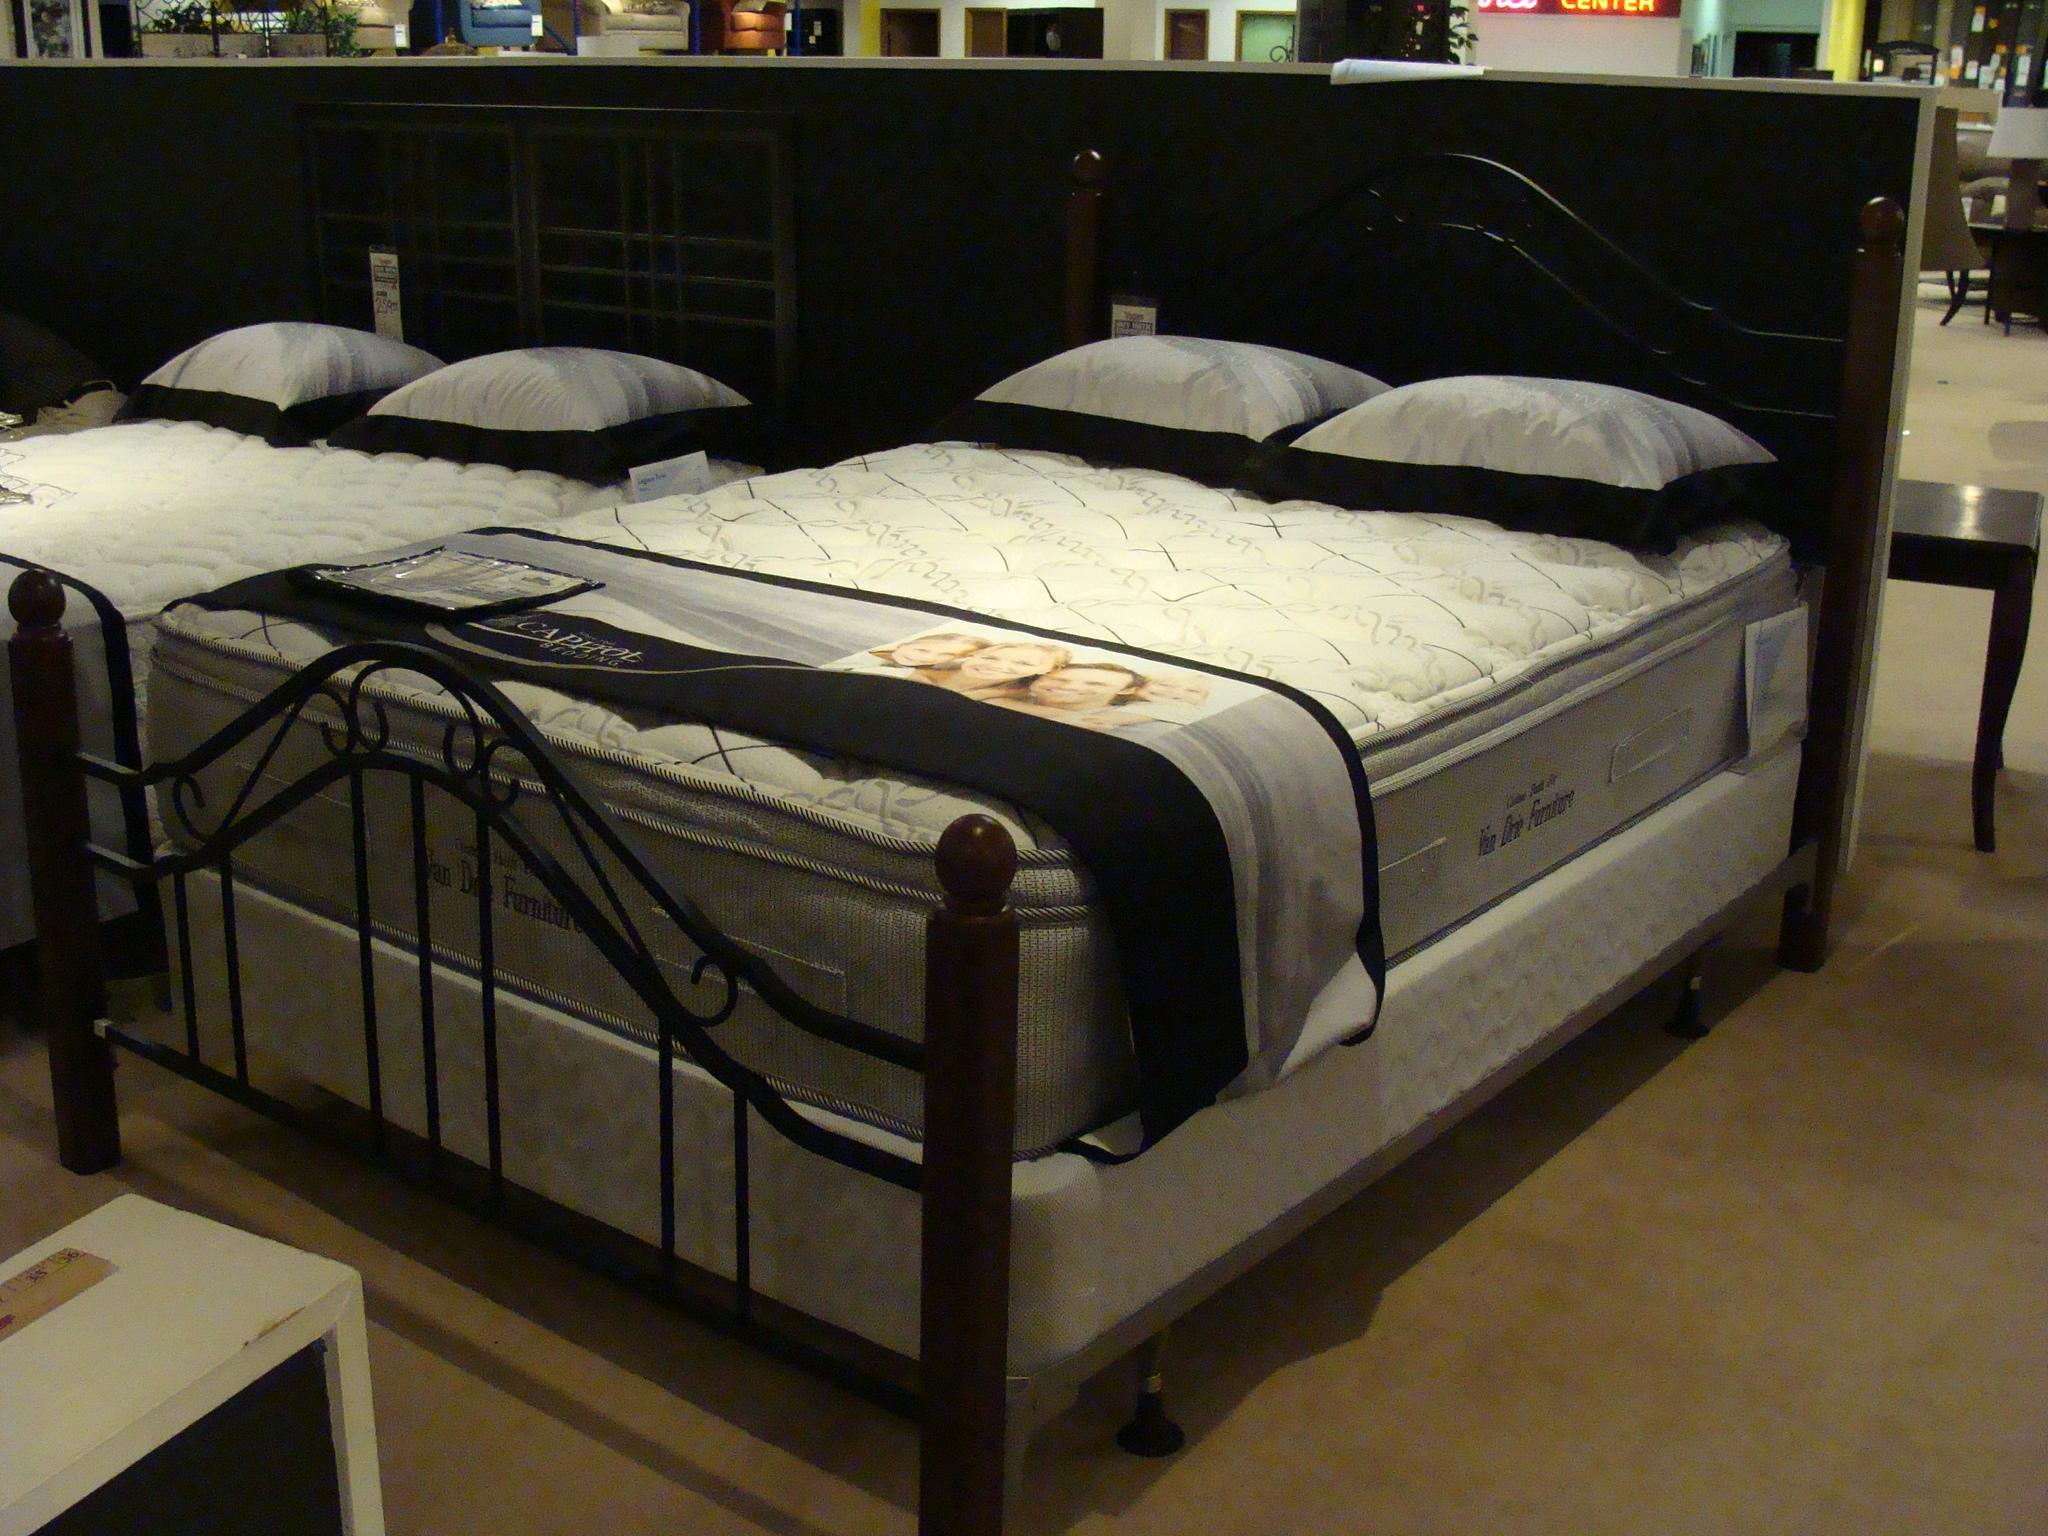 Capitol Bedding Aurora King Mattress Only - Item Number: PillowTop-K